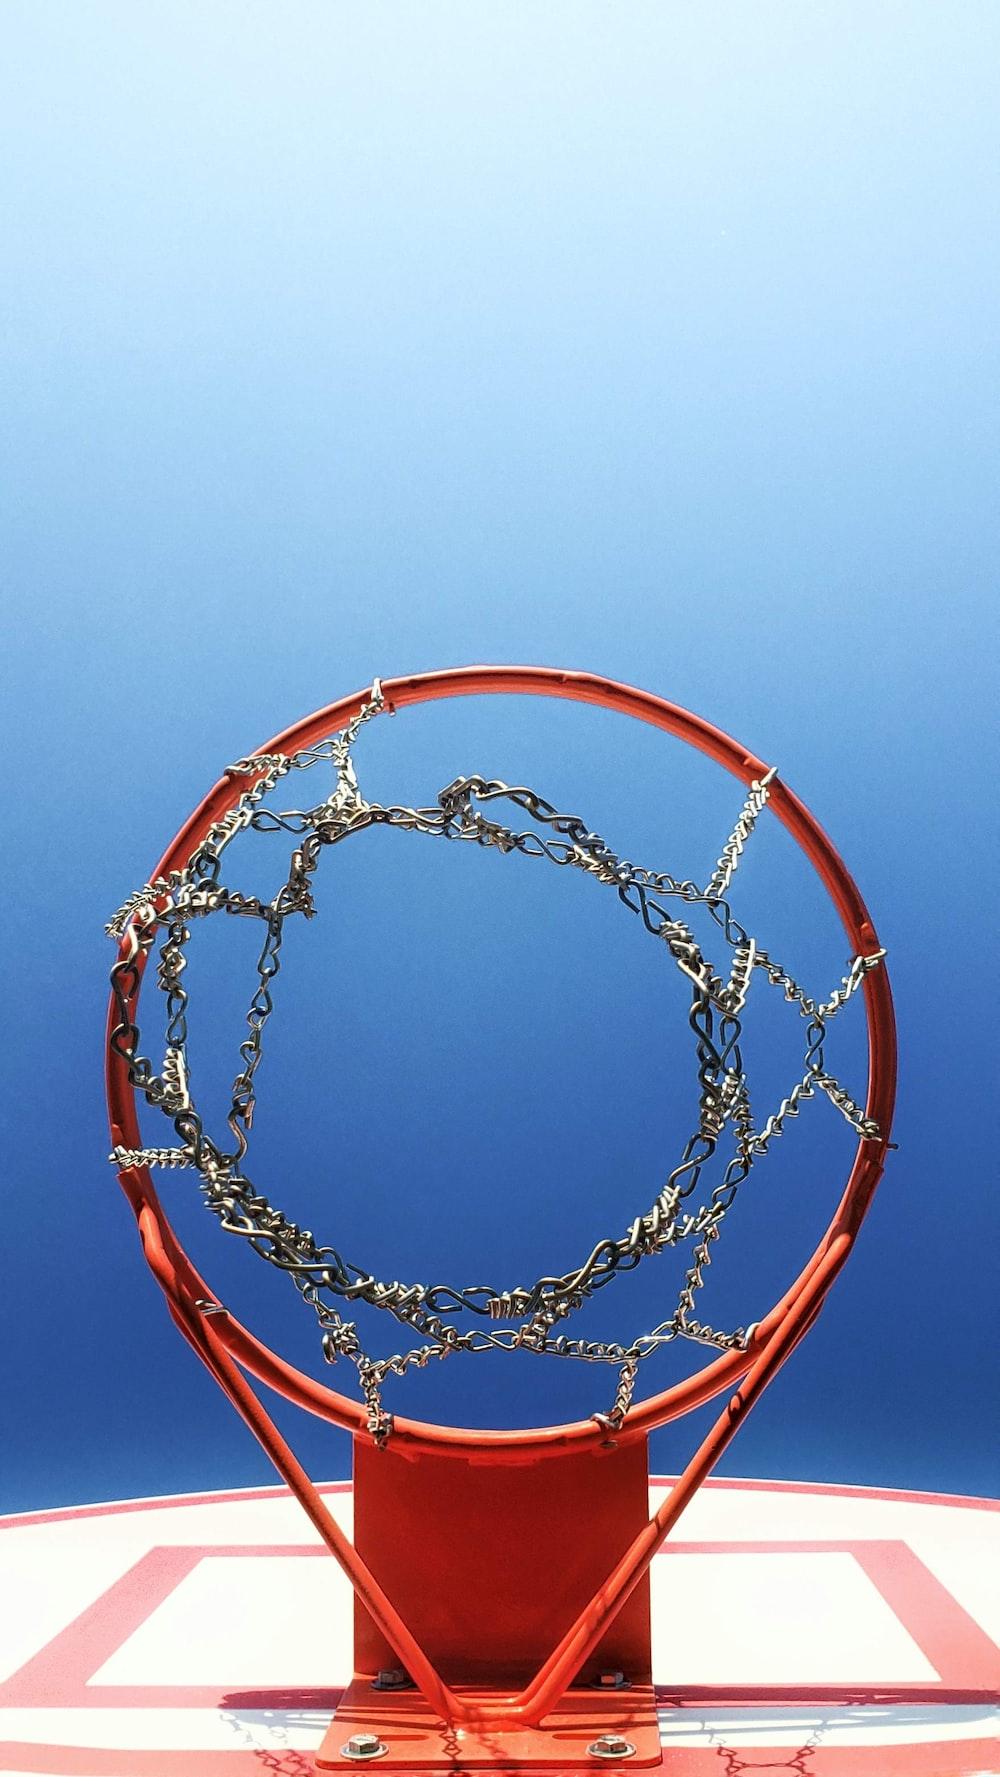 photo of basketball hoops